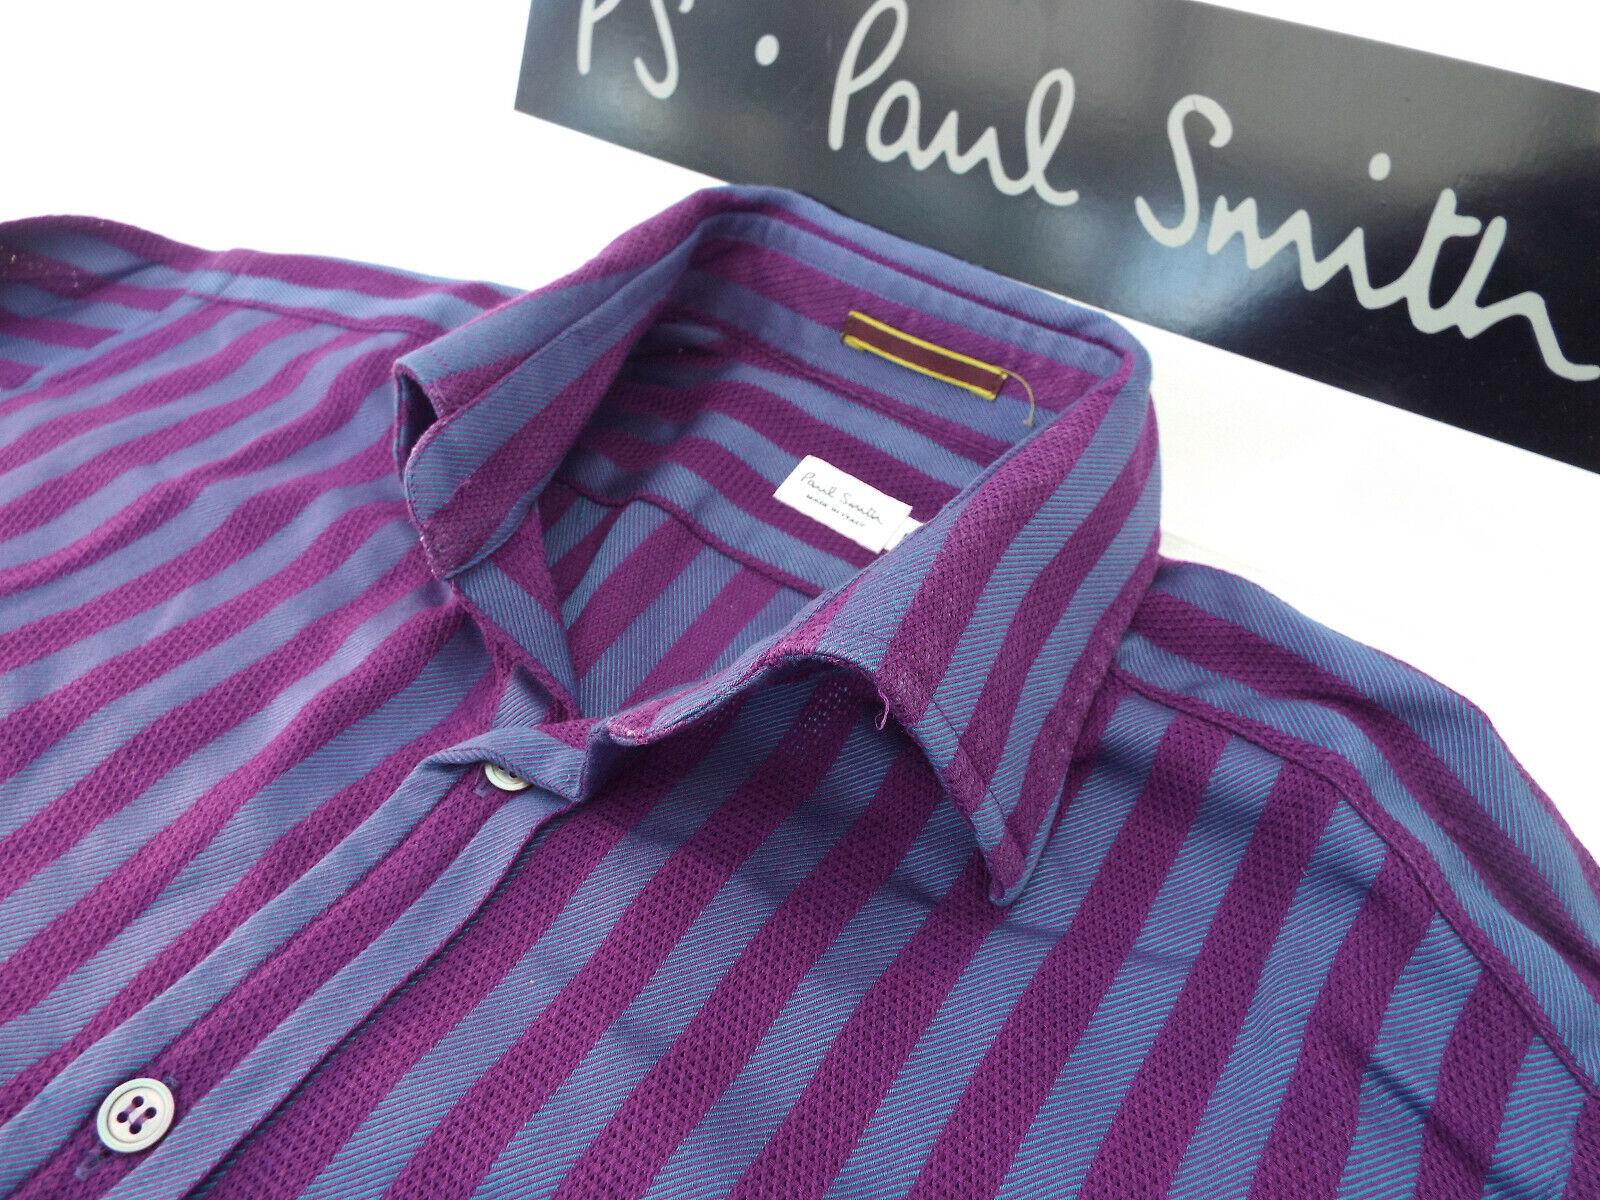 PAUL SMITH Männers MAINLINE Hemd  Größe 15  (CHEST 38 )  +STRIPED